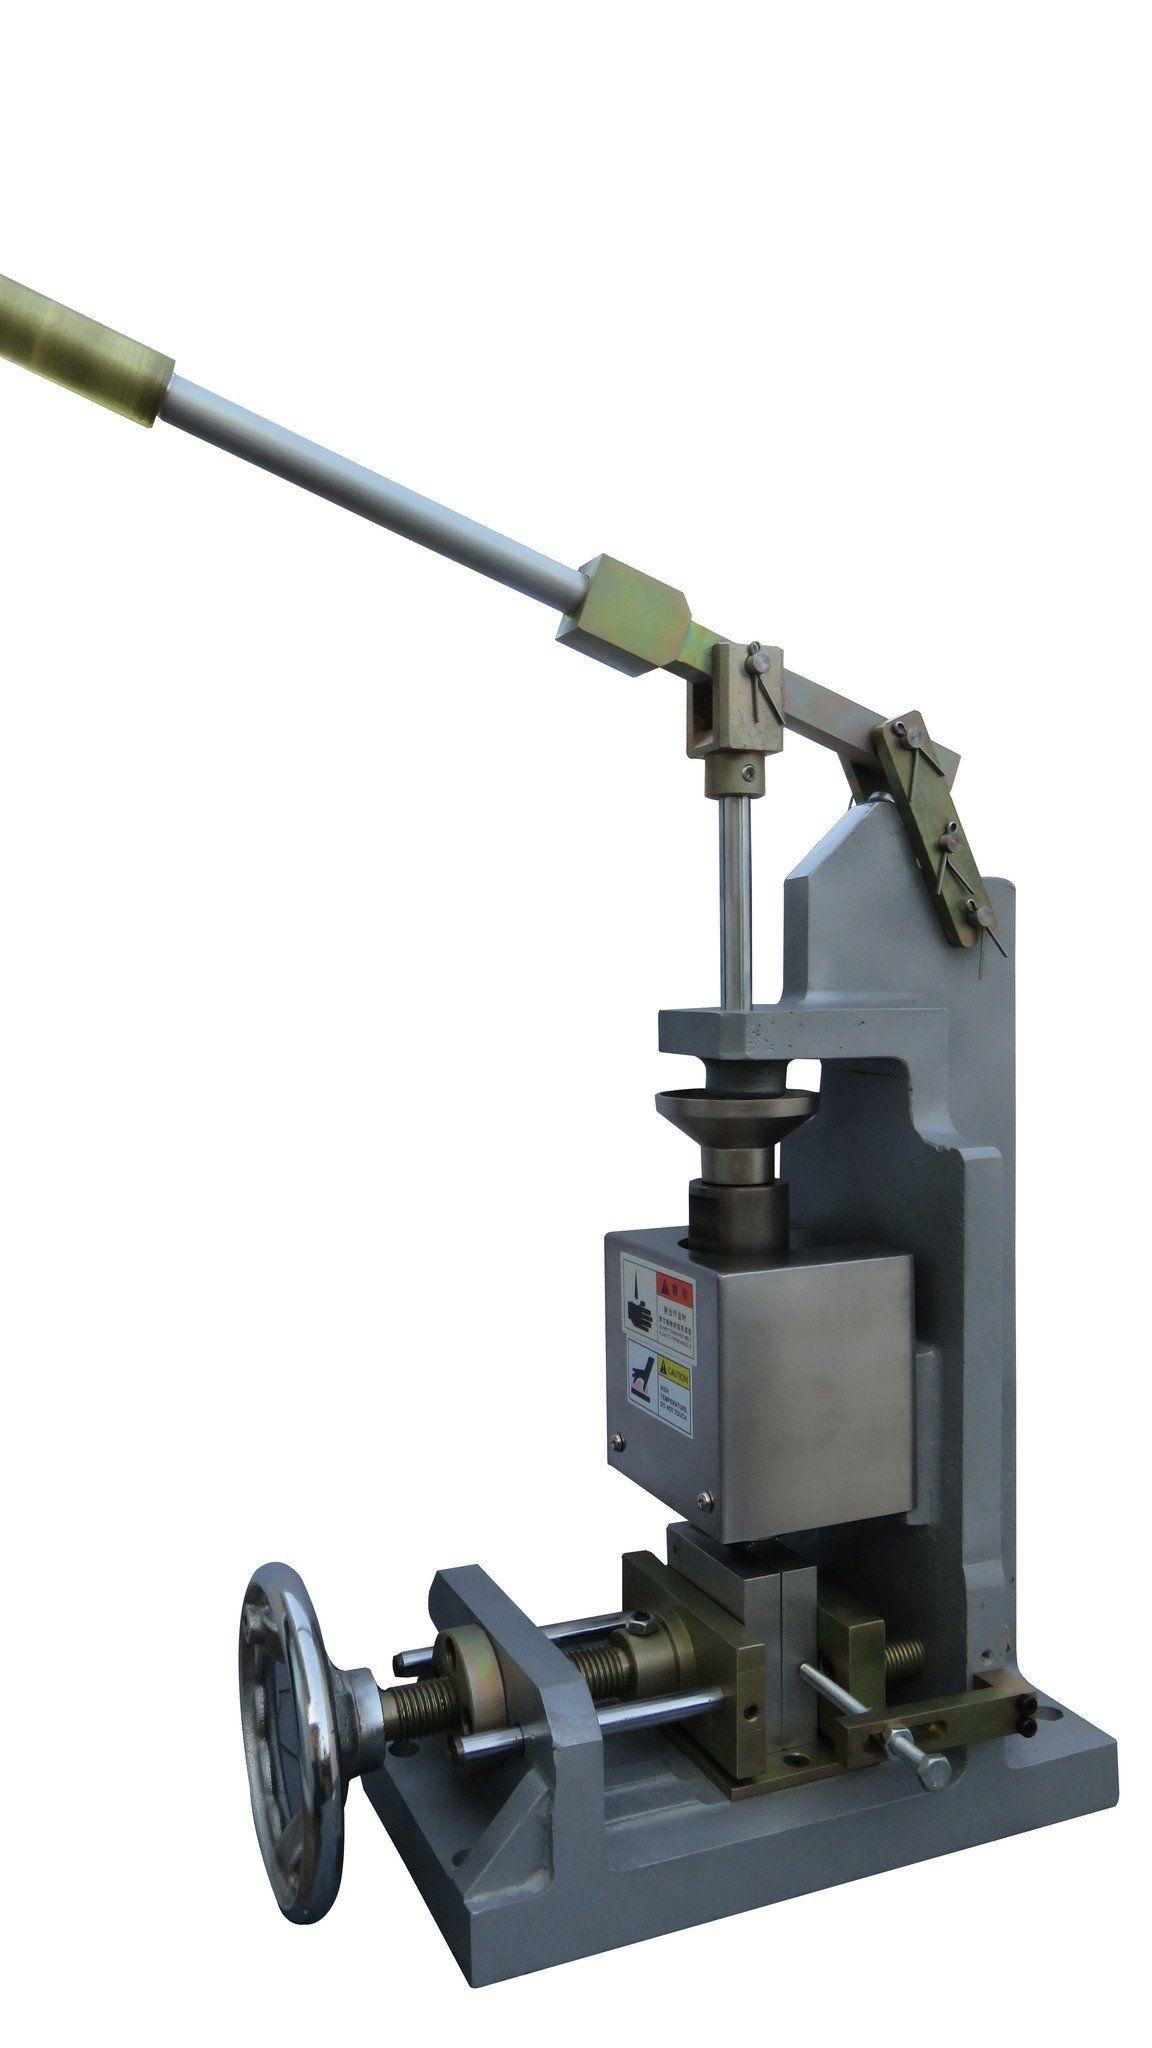 Manual Benchtop Injection Molding Machine Mim 200 Inclu A Standard